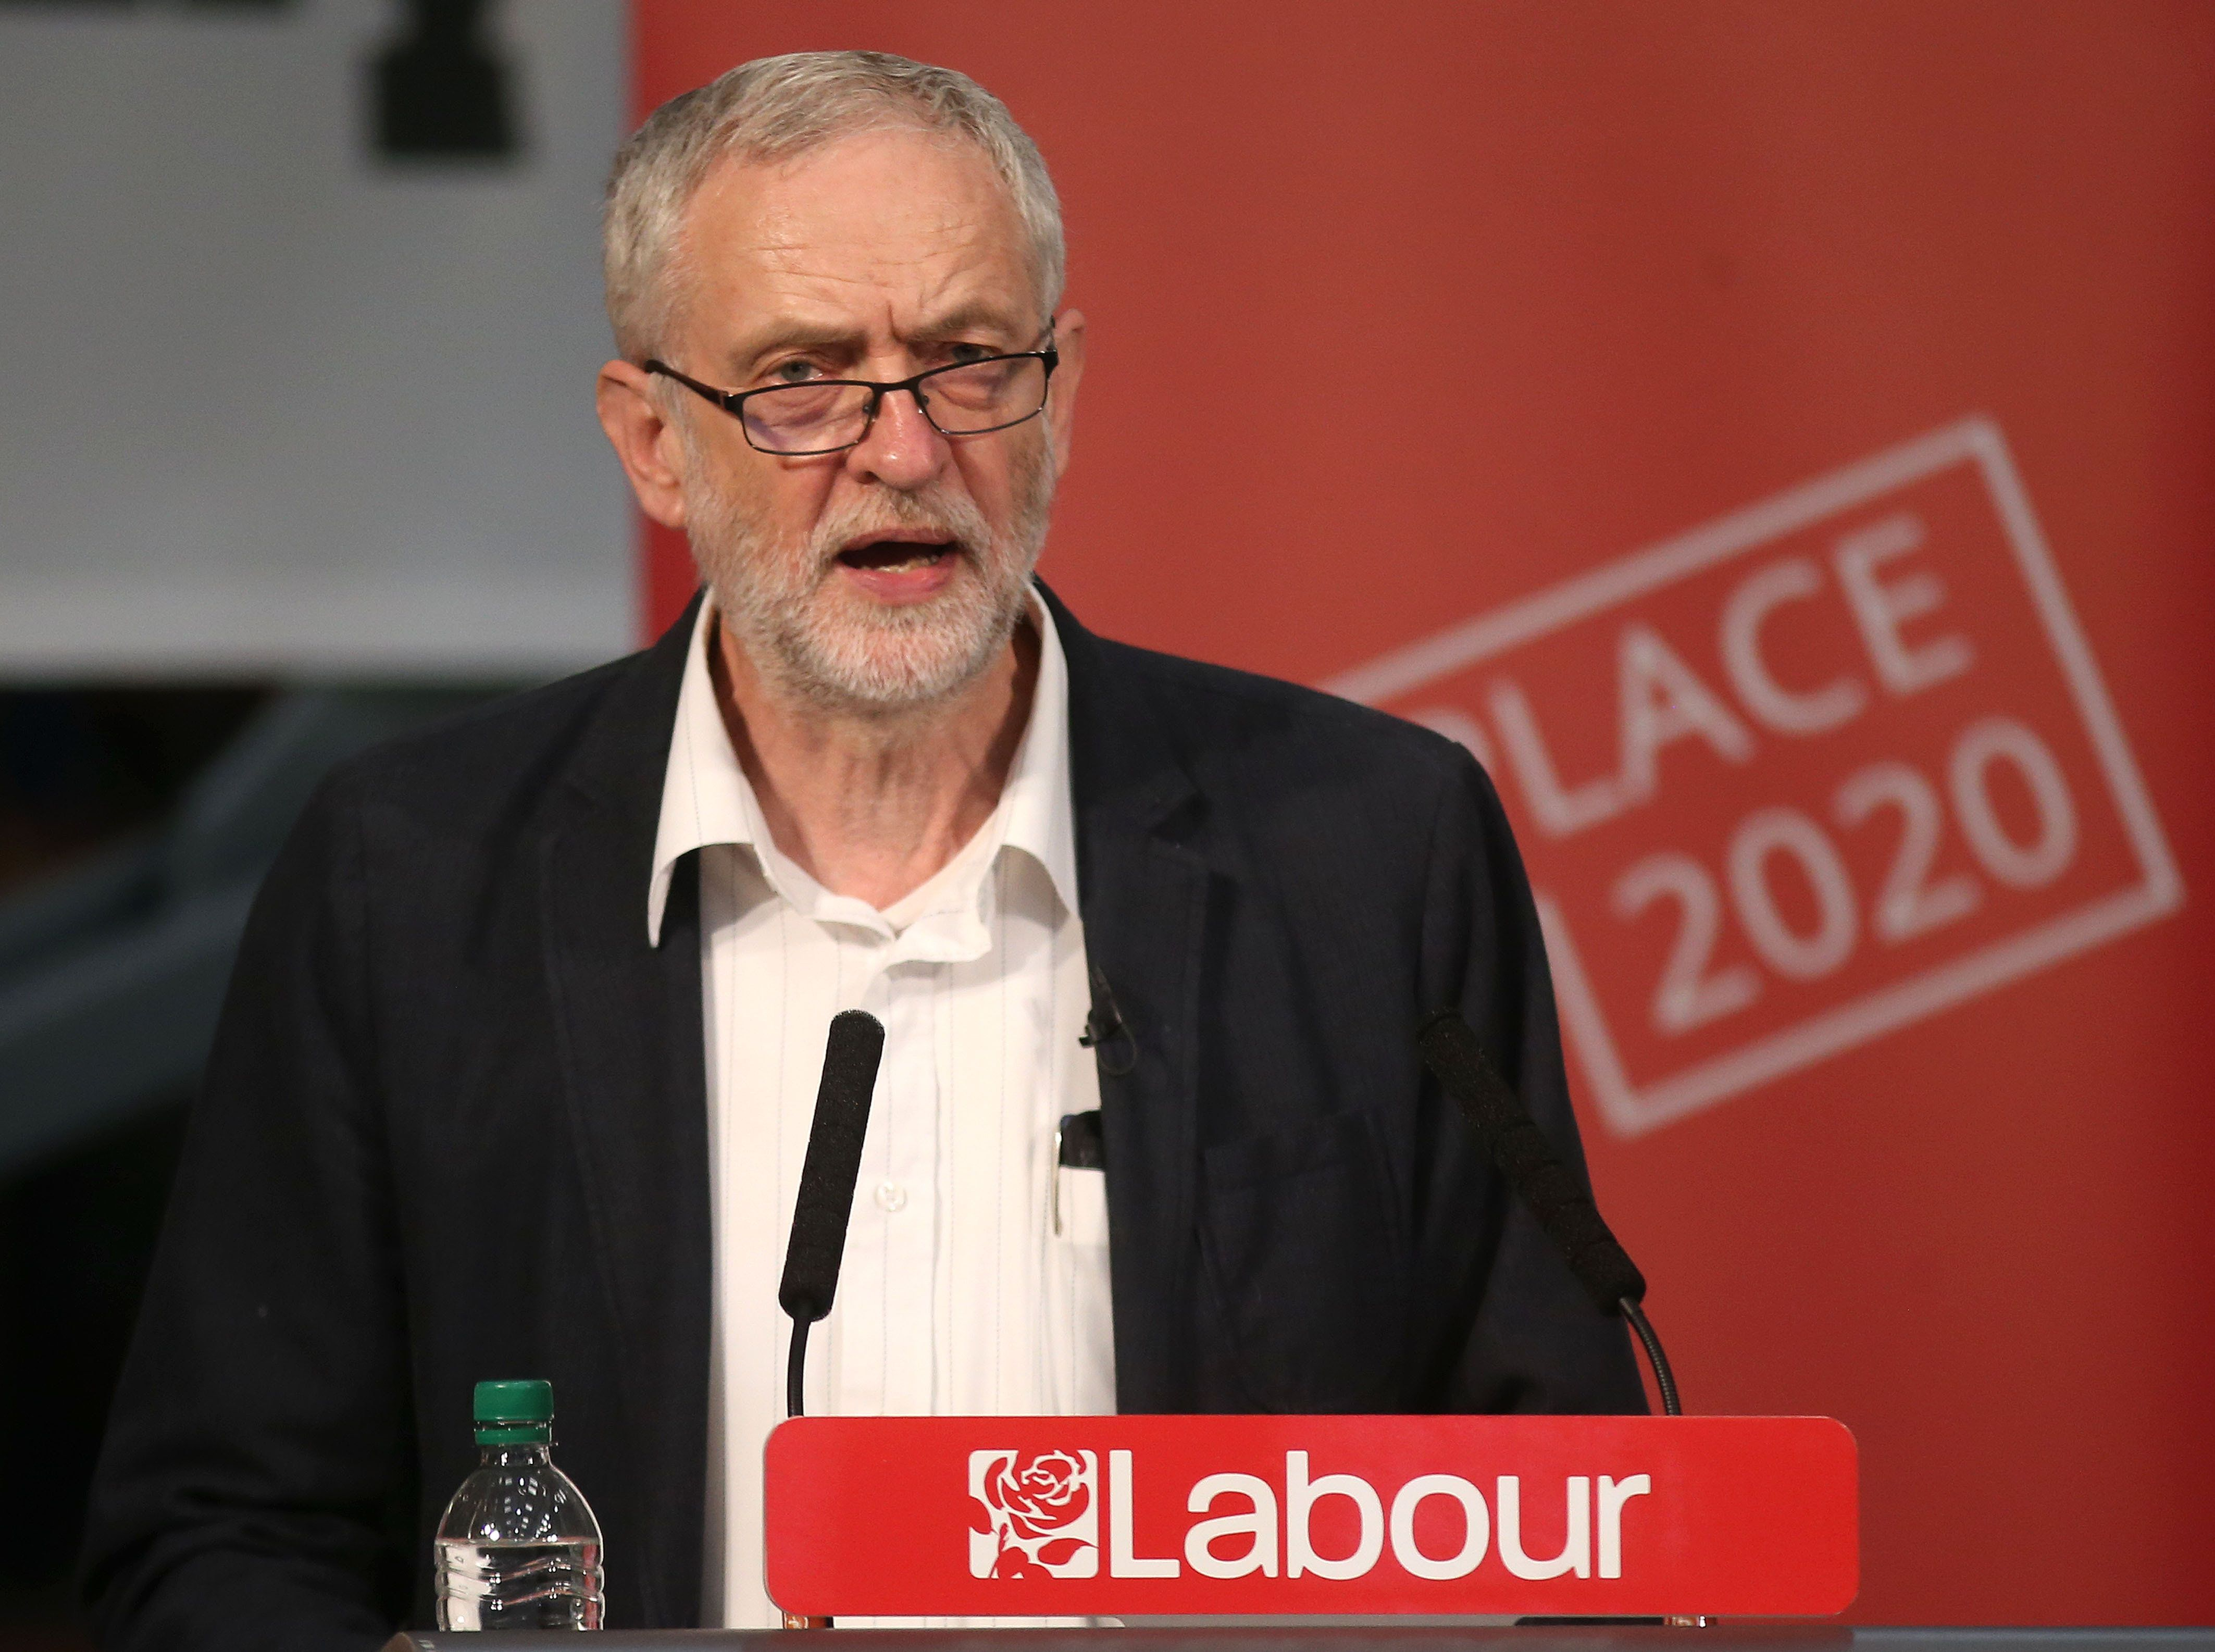 Labour leader Jeremy Corbyn said the voter registration deadline should be